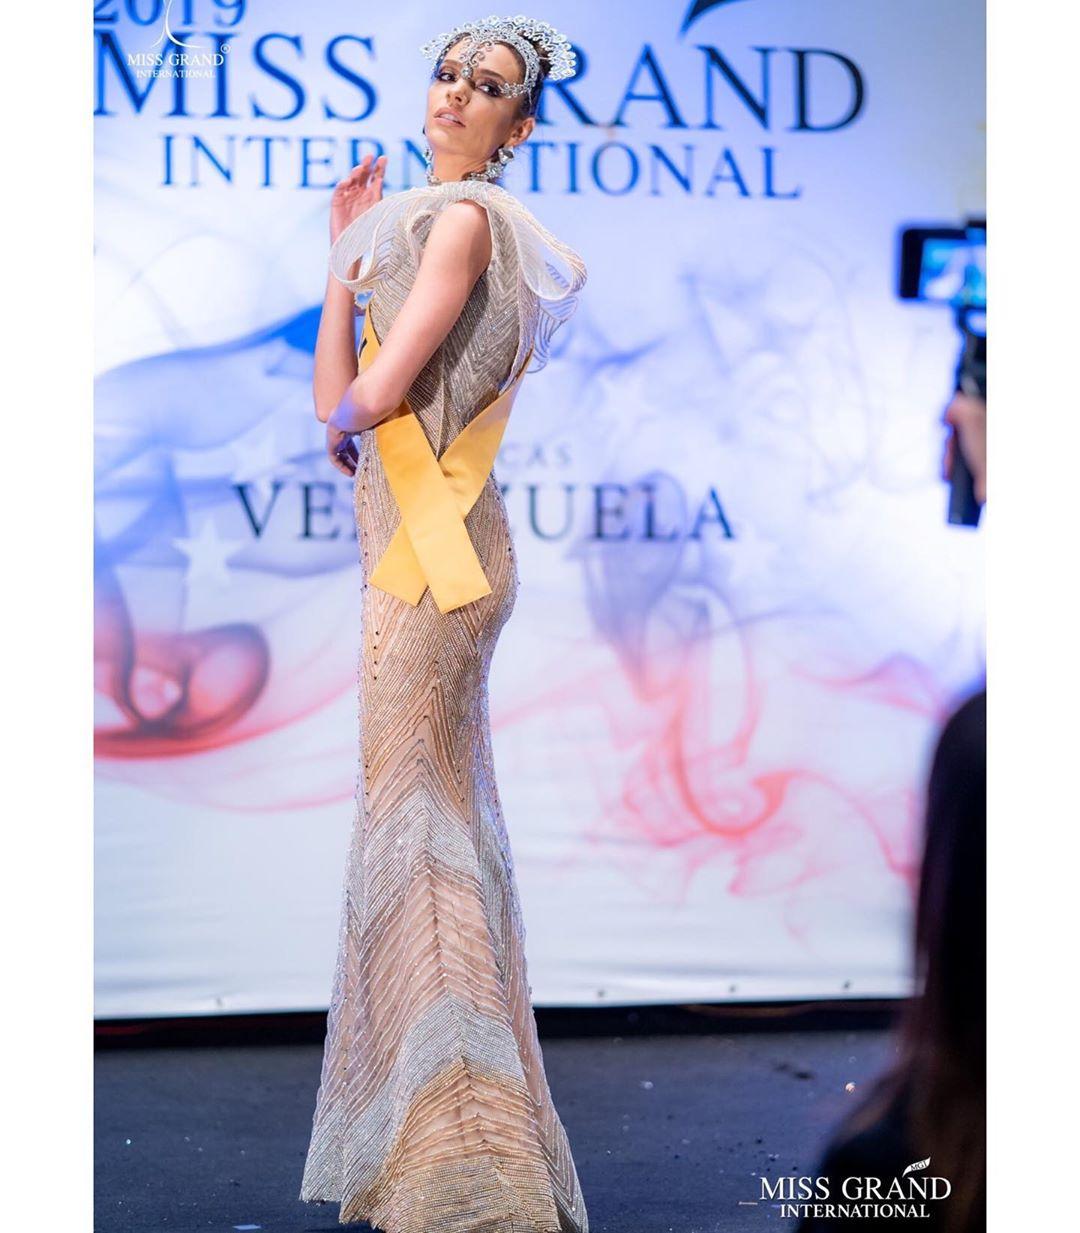 ainara de santamaria villamor, top 21 de miss grand international 2019/miss world cantabria 2018/miss earth spain 2017. - Página 15 70993510